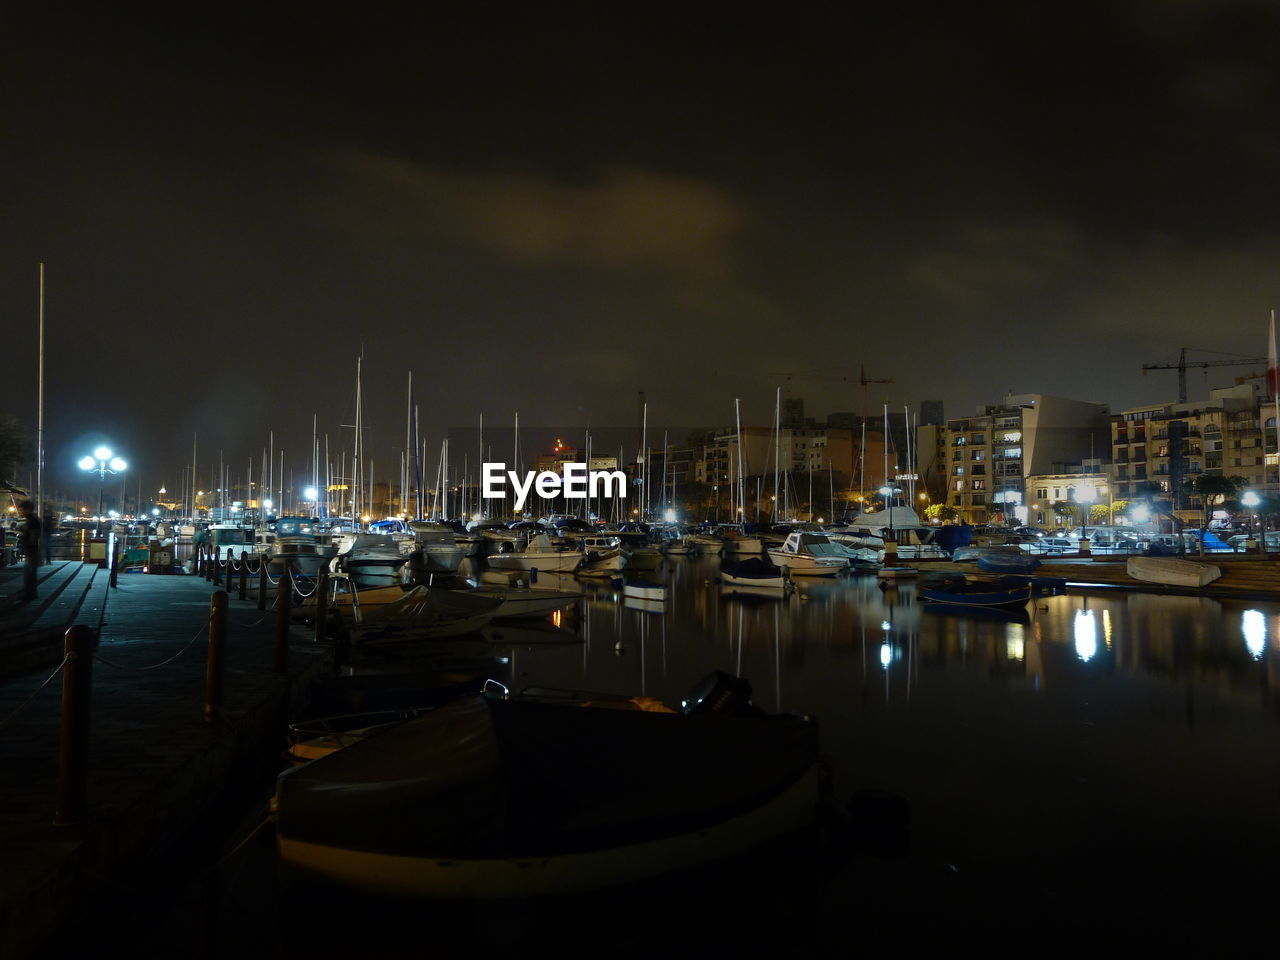 nautical vessel, moored, mode of transportation, night, transportation, illuminated, harbor, water, sailboat, sky, mast, sea, nature, no people, architecture, city, cloud - sky, yacht, pole, port, marina, anchored